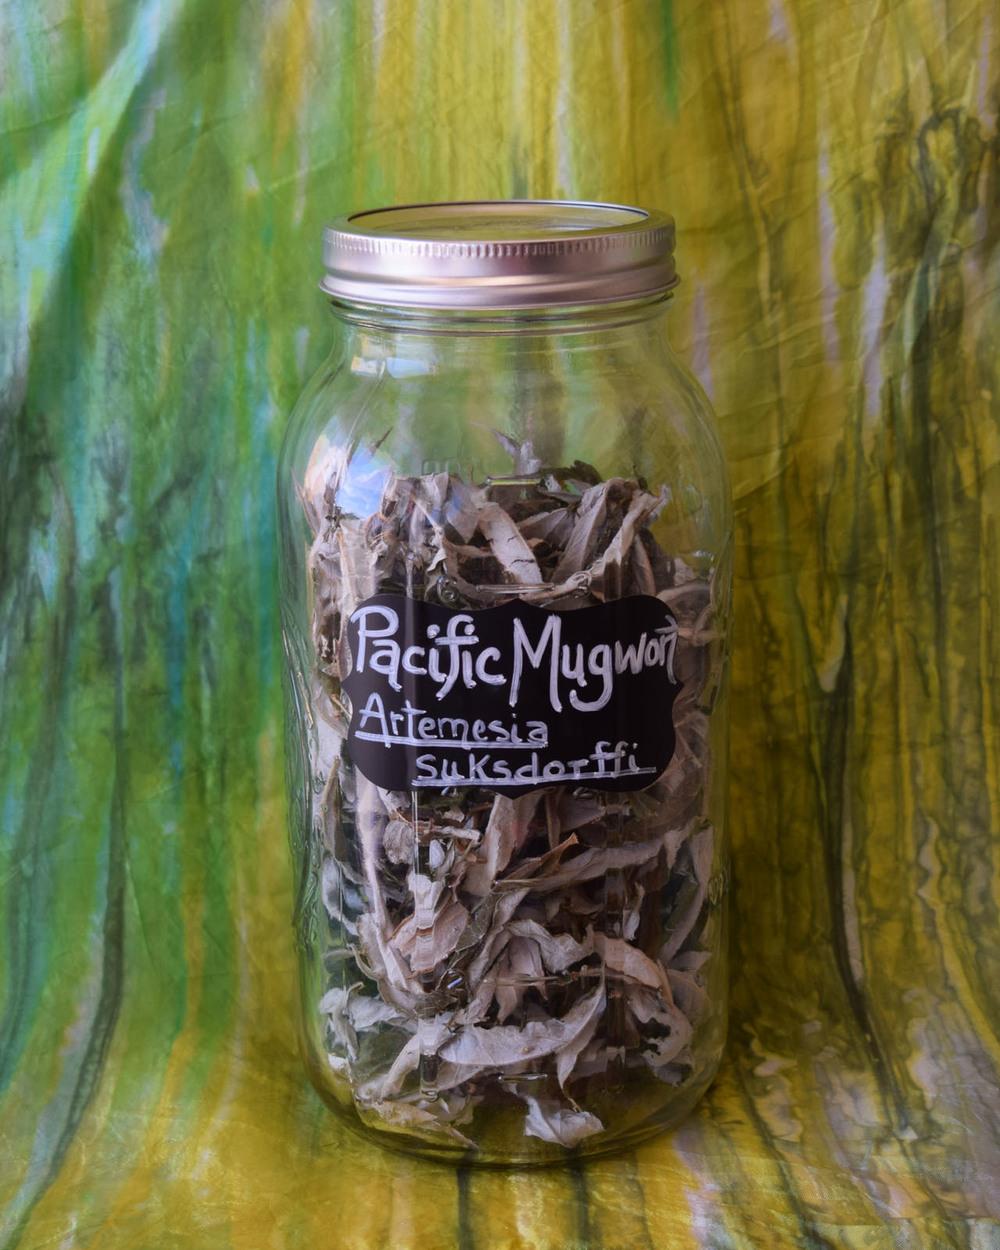 Pacific Mugwort**